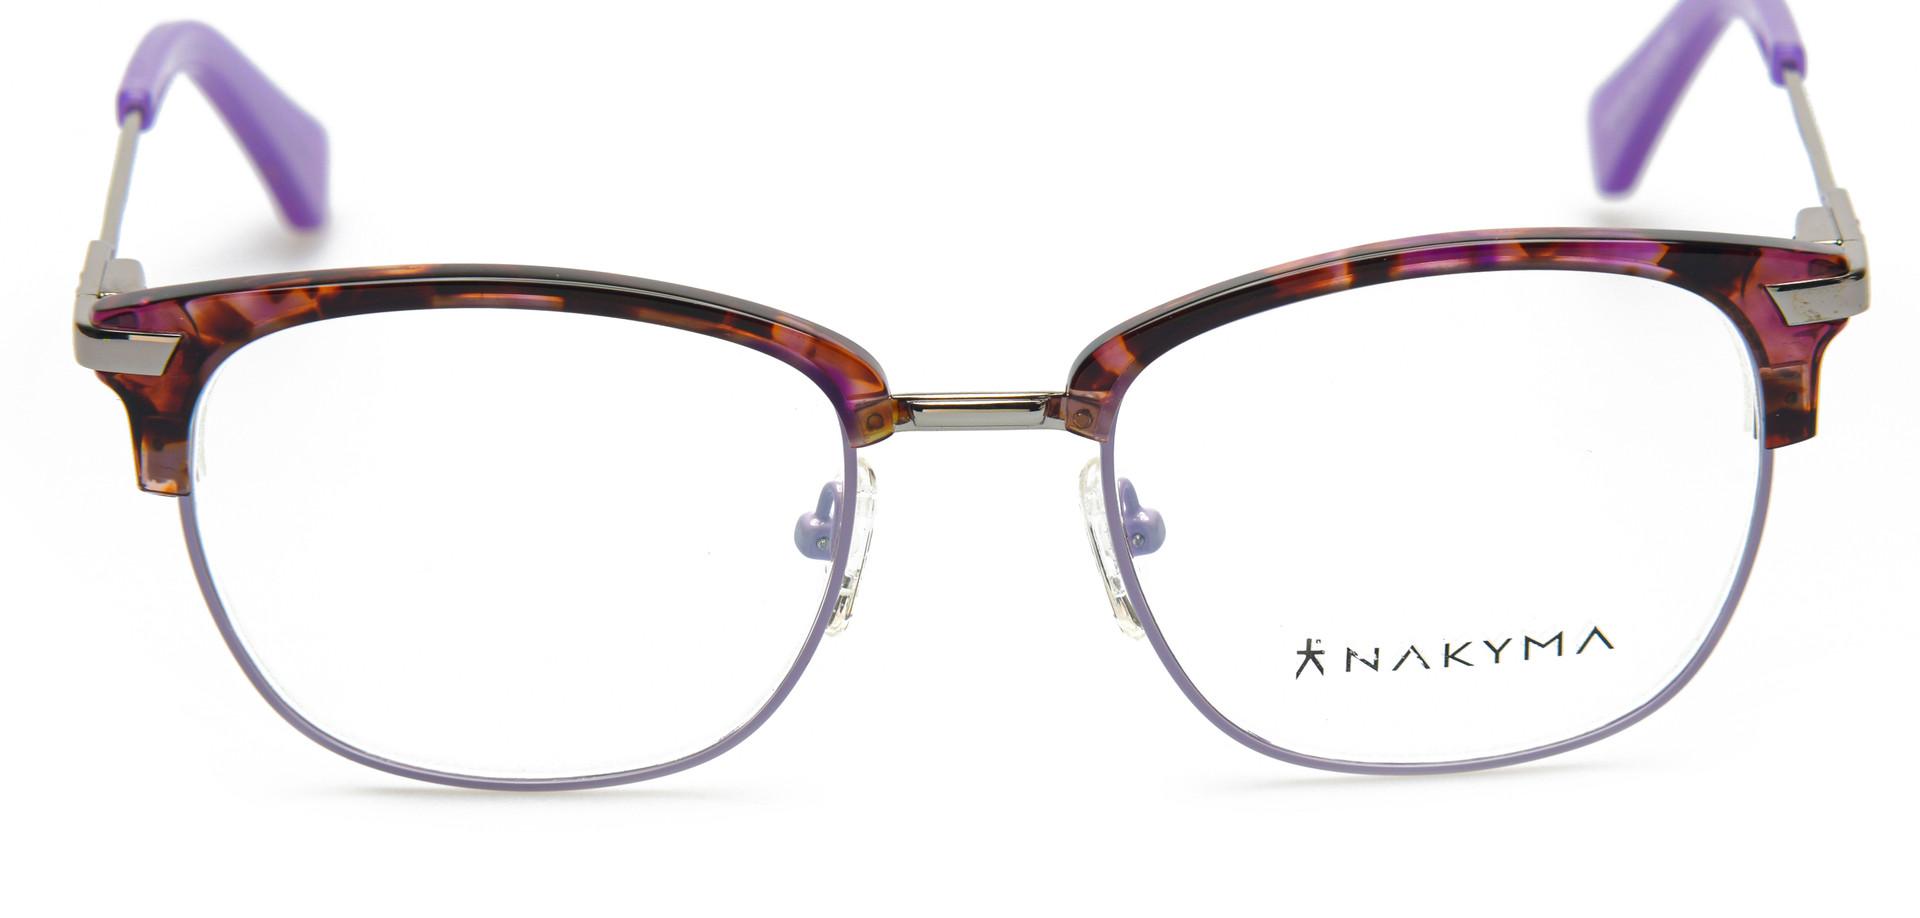 8R1-NAKYMA-V09-C2